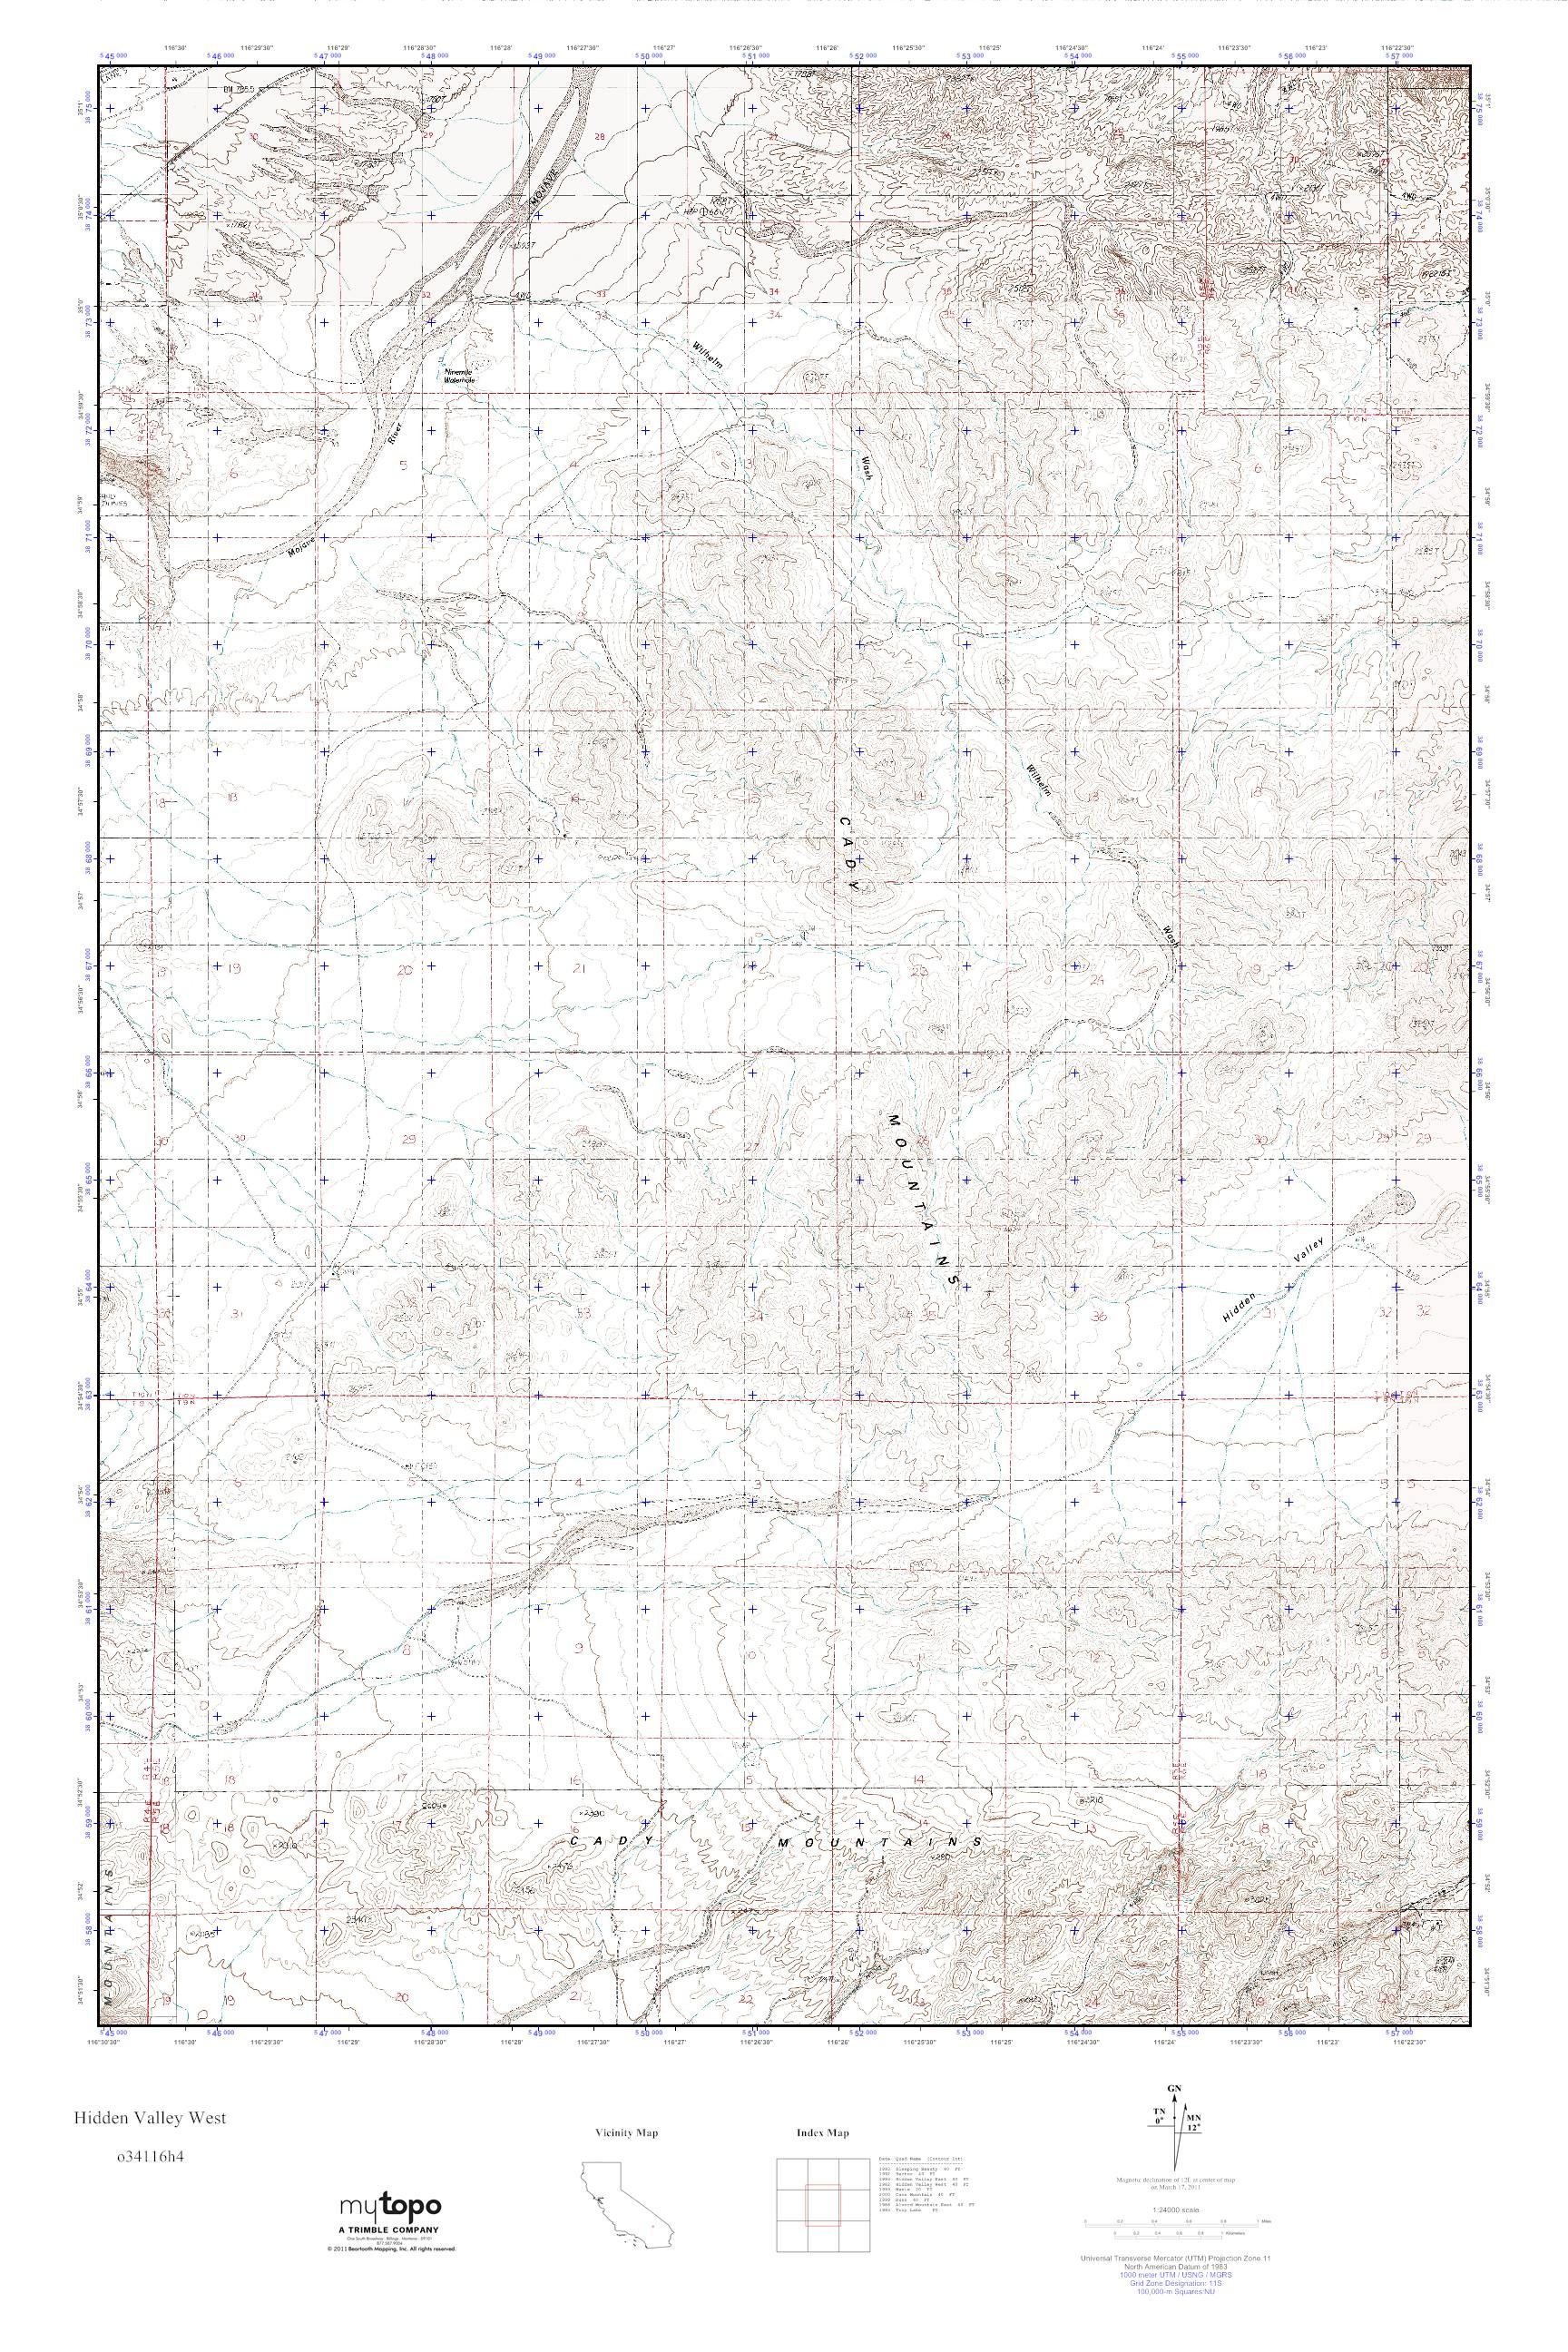 MyTopo Hidden Valley West, California USGS Quad Topo Map